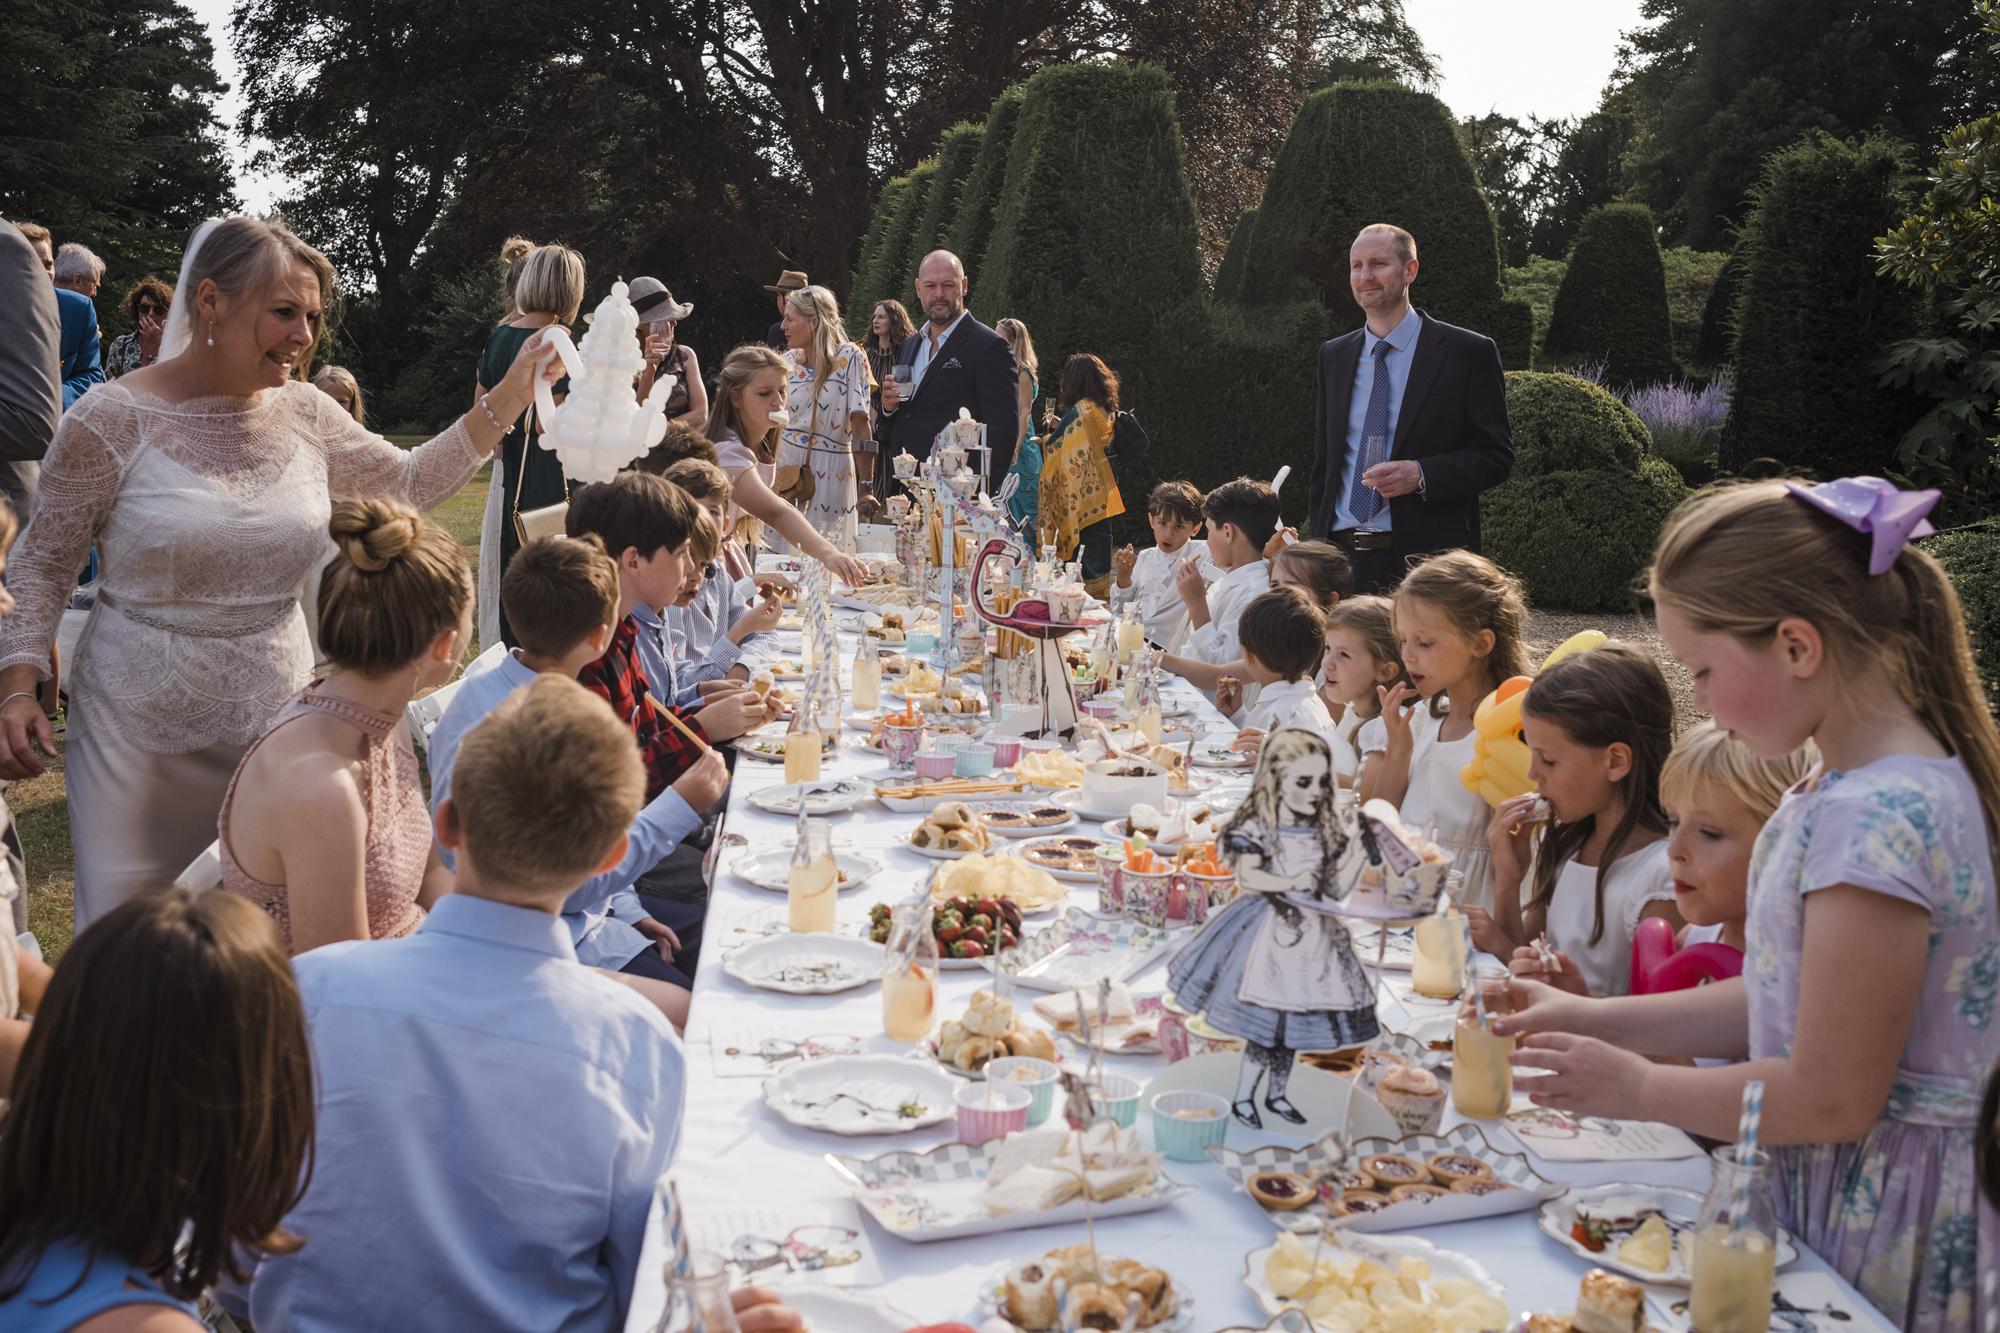 Jaz-Kate-Beaumont-Oyster-Silk-Bias-Cut-Wedding-Gown-Larkspur-Lace-Top-Sussex-Wedding-16.jpg